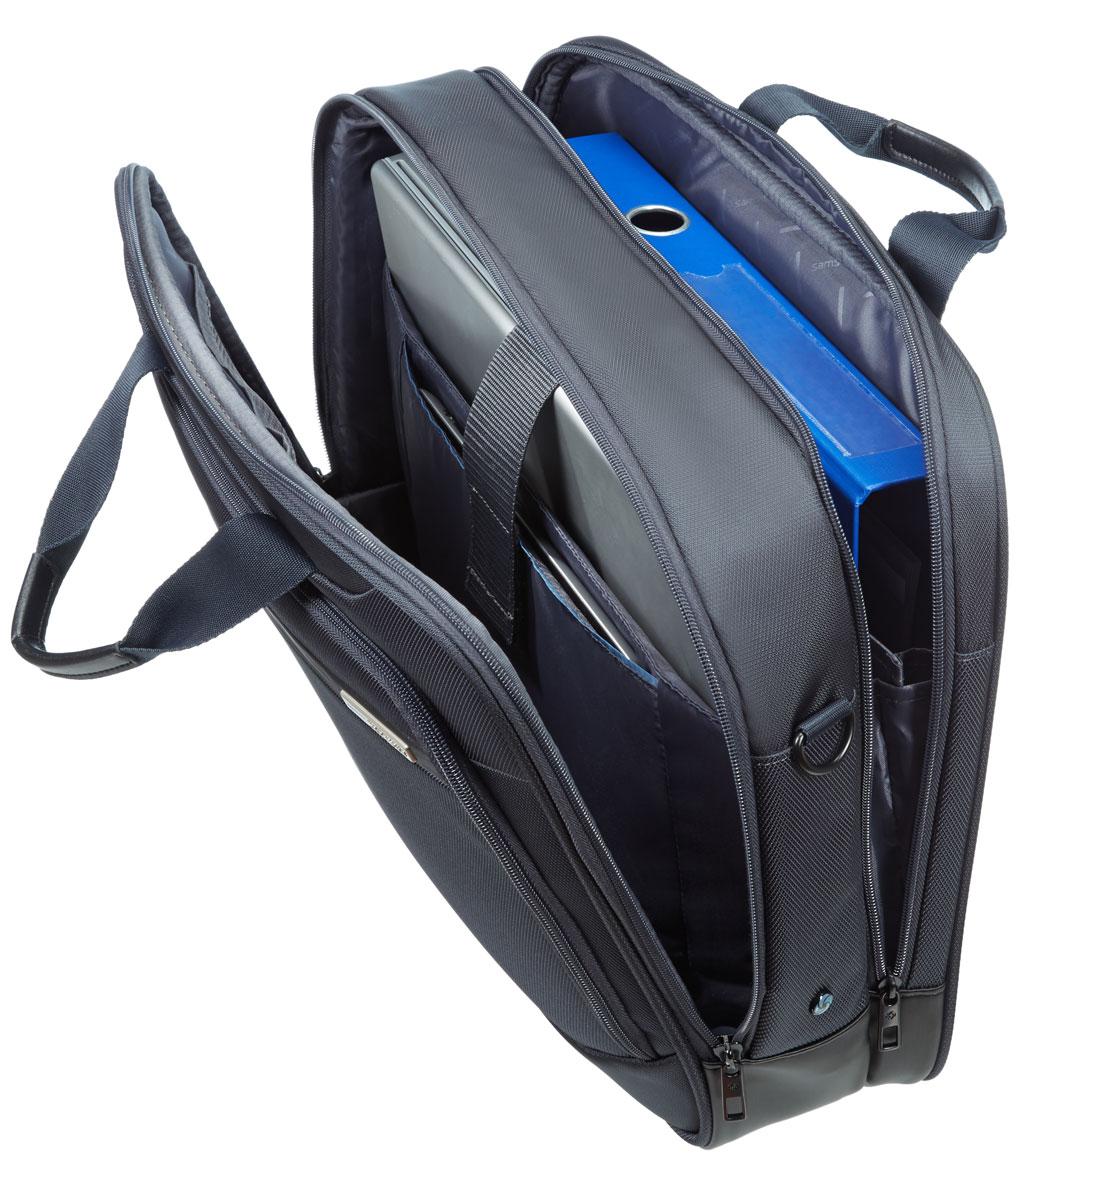 Сумка для ноутбука Samsonite GuardIt, цвет: темно-серый, 43,5 х 33 х 13,5 см сумка для ноутбука samsonite сумка для ноутбука 17 3 vectura 45 5x38 5x13 5 см